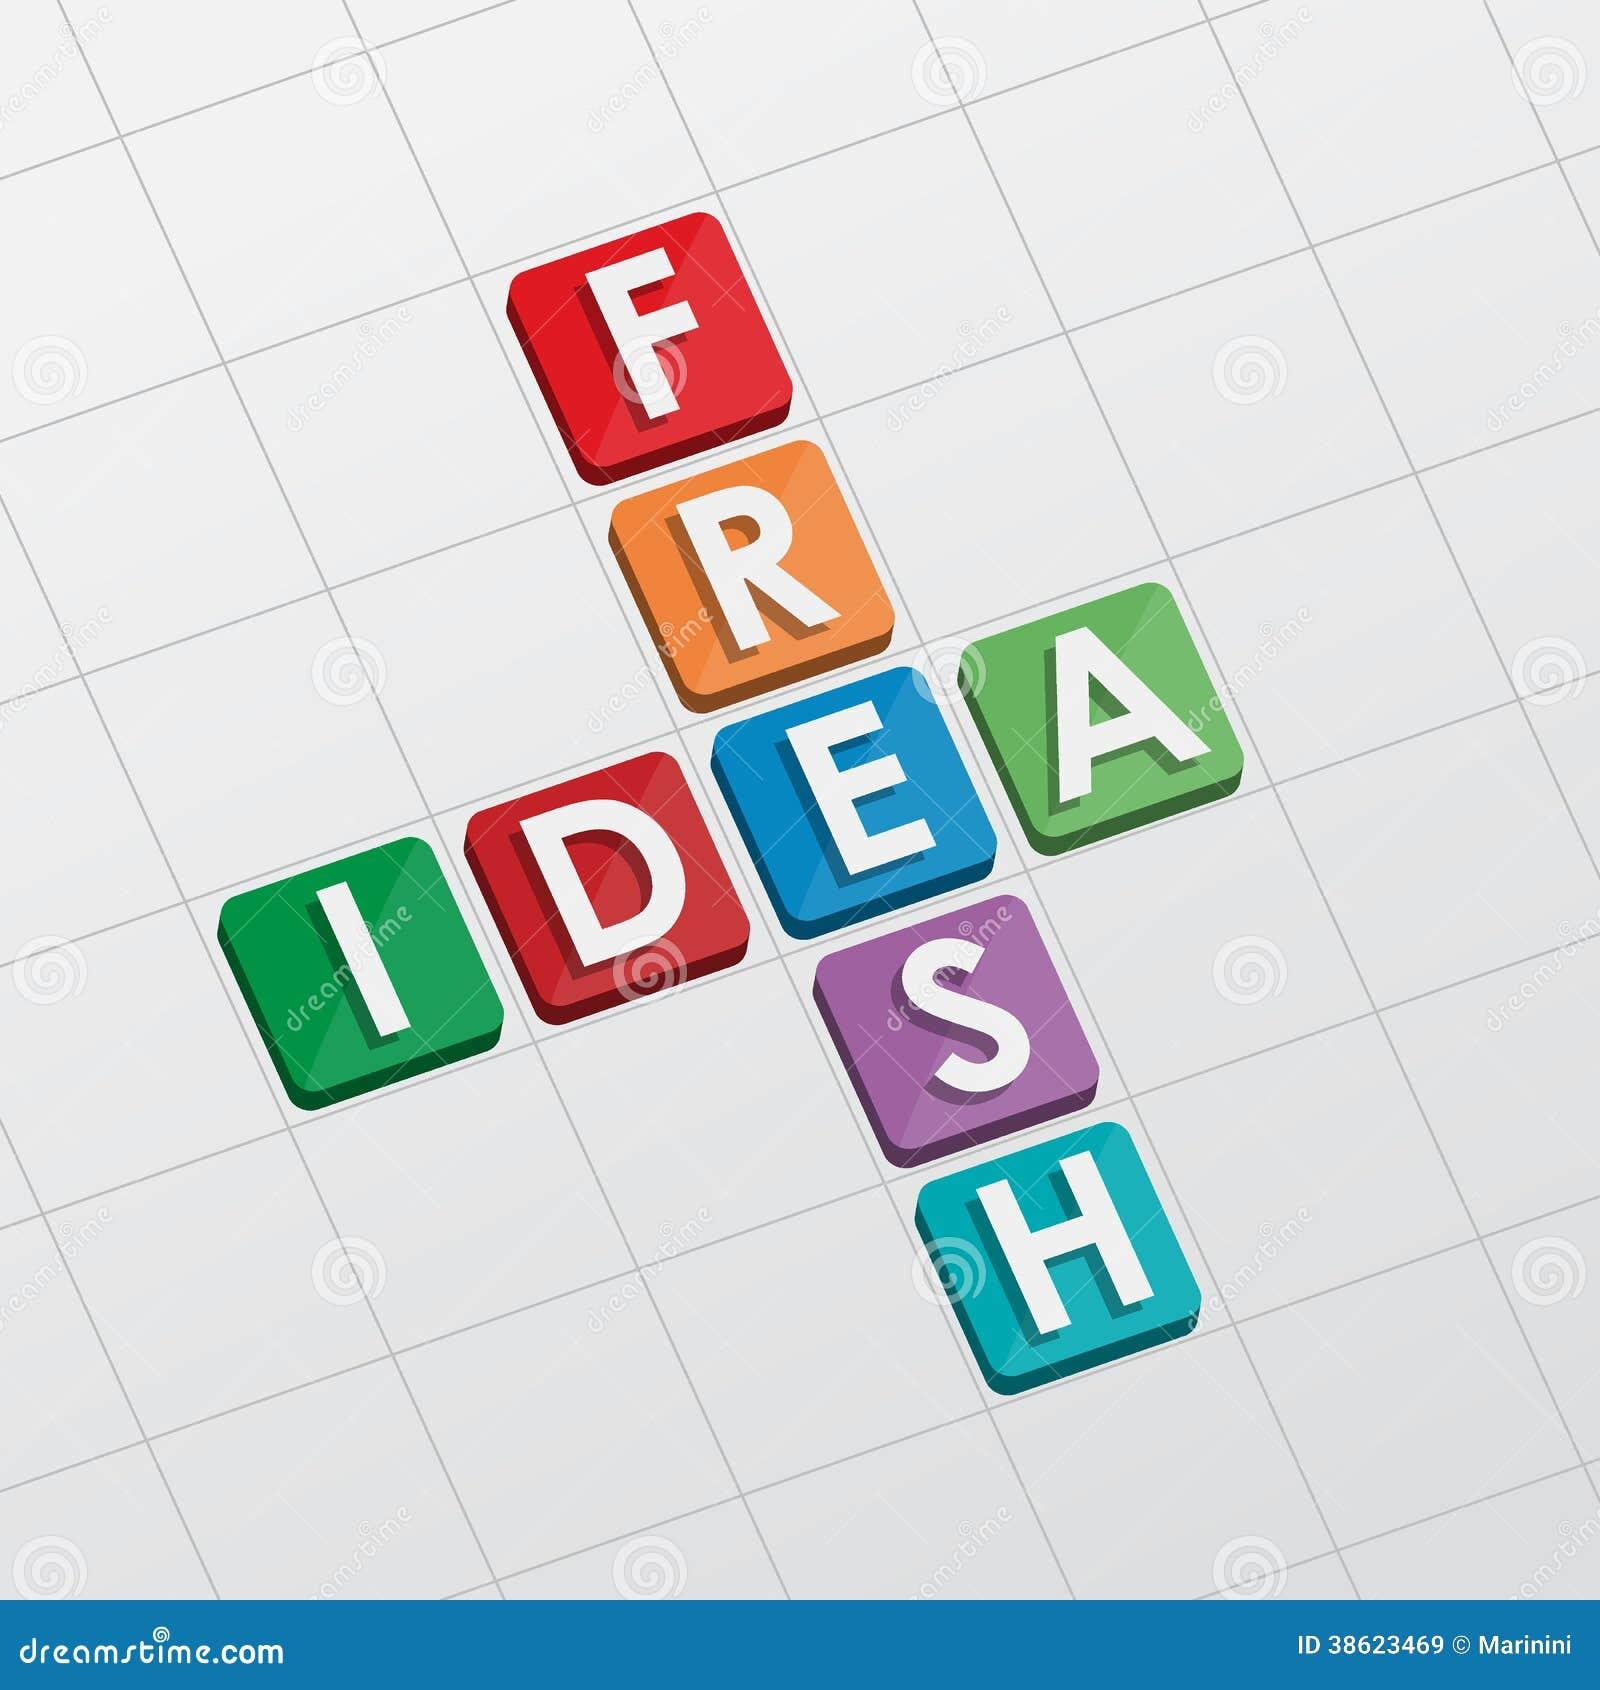 Fresh idea crossword flat design stock image image of develop royalty free stock photo malvernweather Choice Image